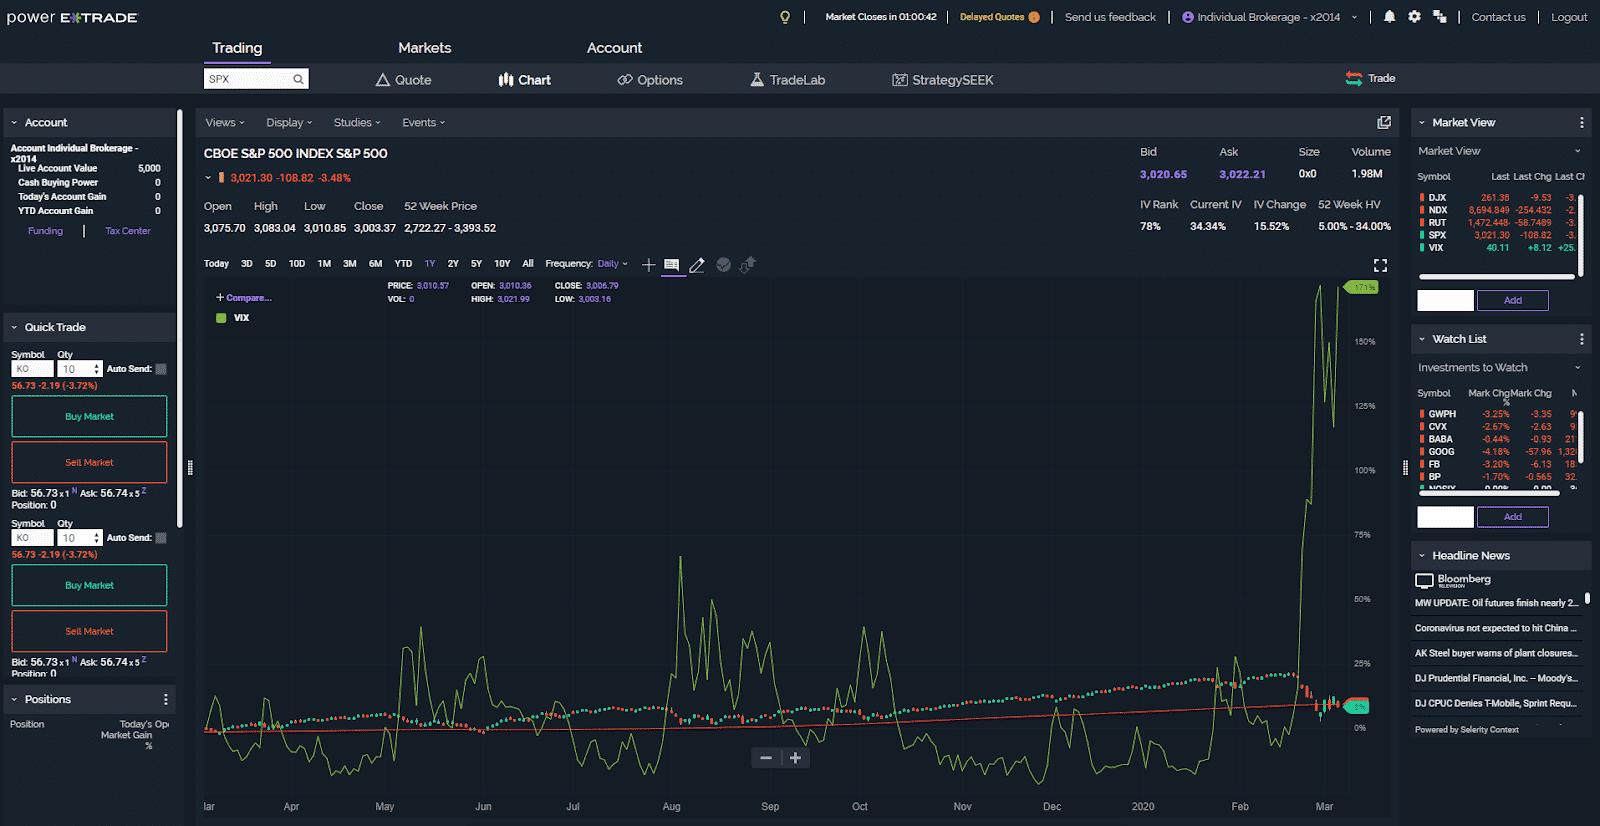 E*TRADE broker, chart on the screen